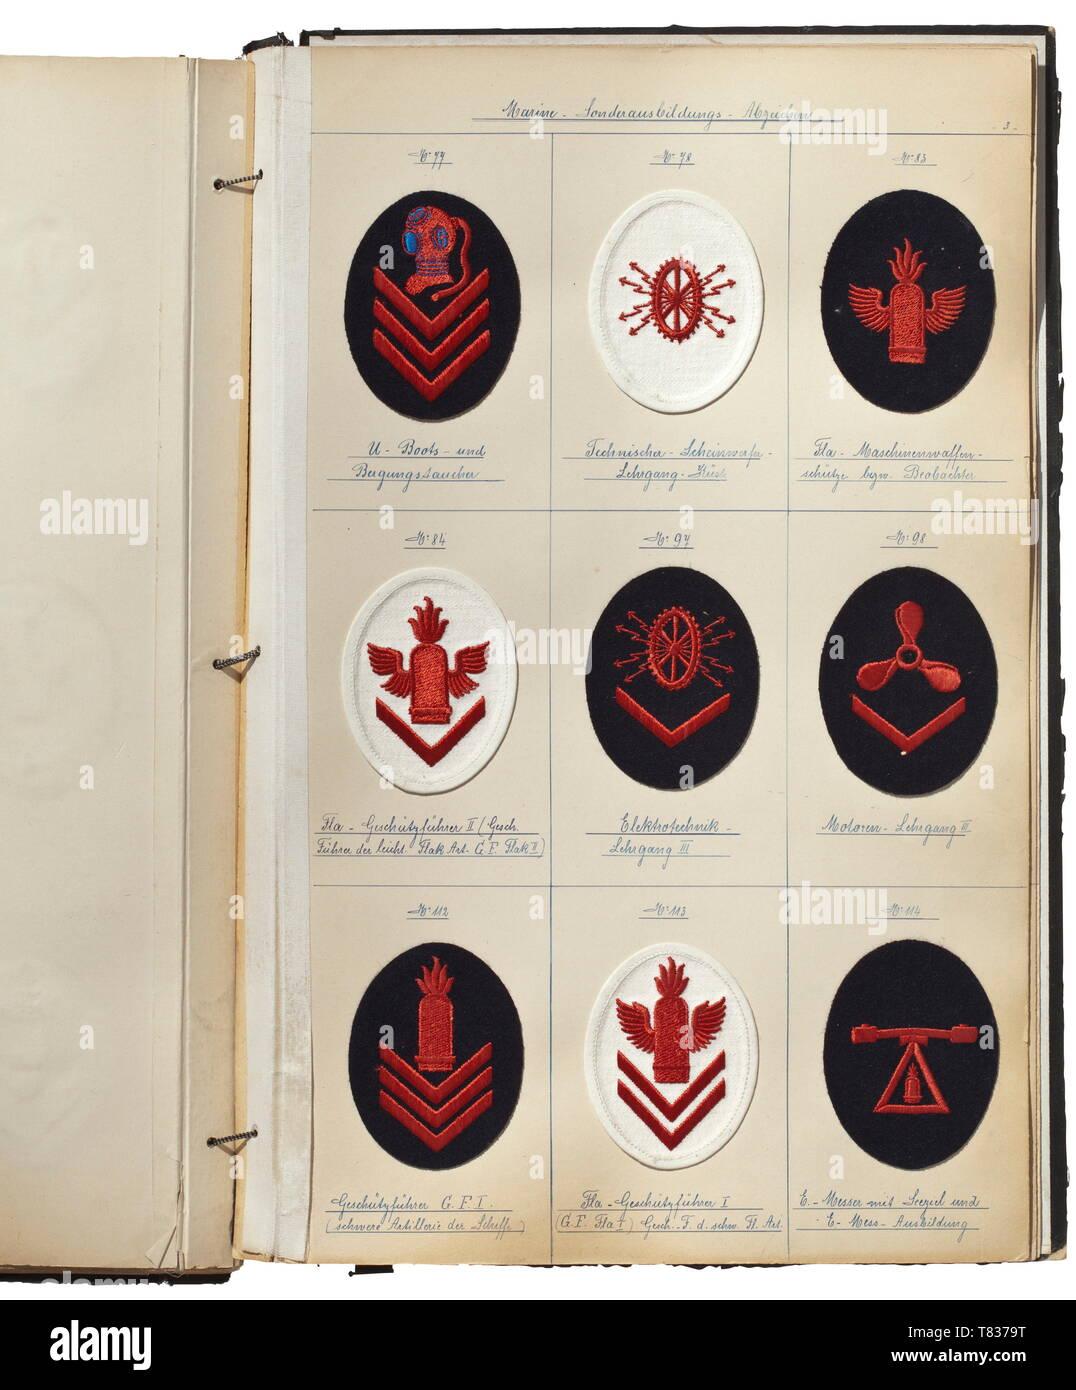 Navy Insignia Stock Photos & Navy Insignia Stock Images - Alamy